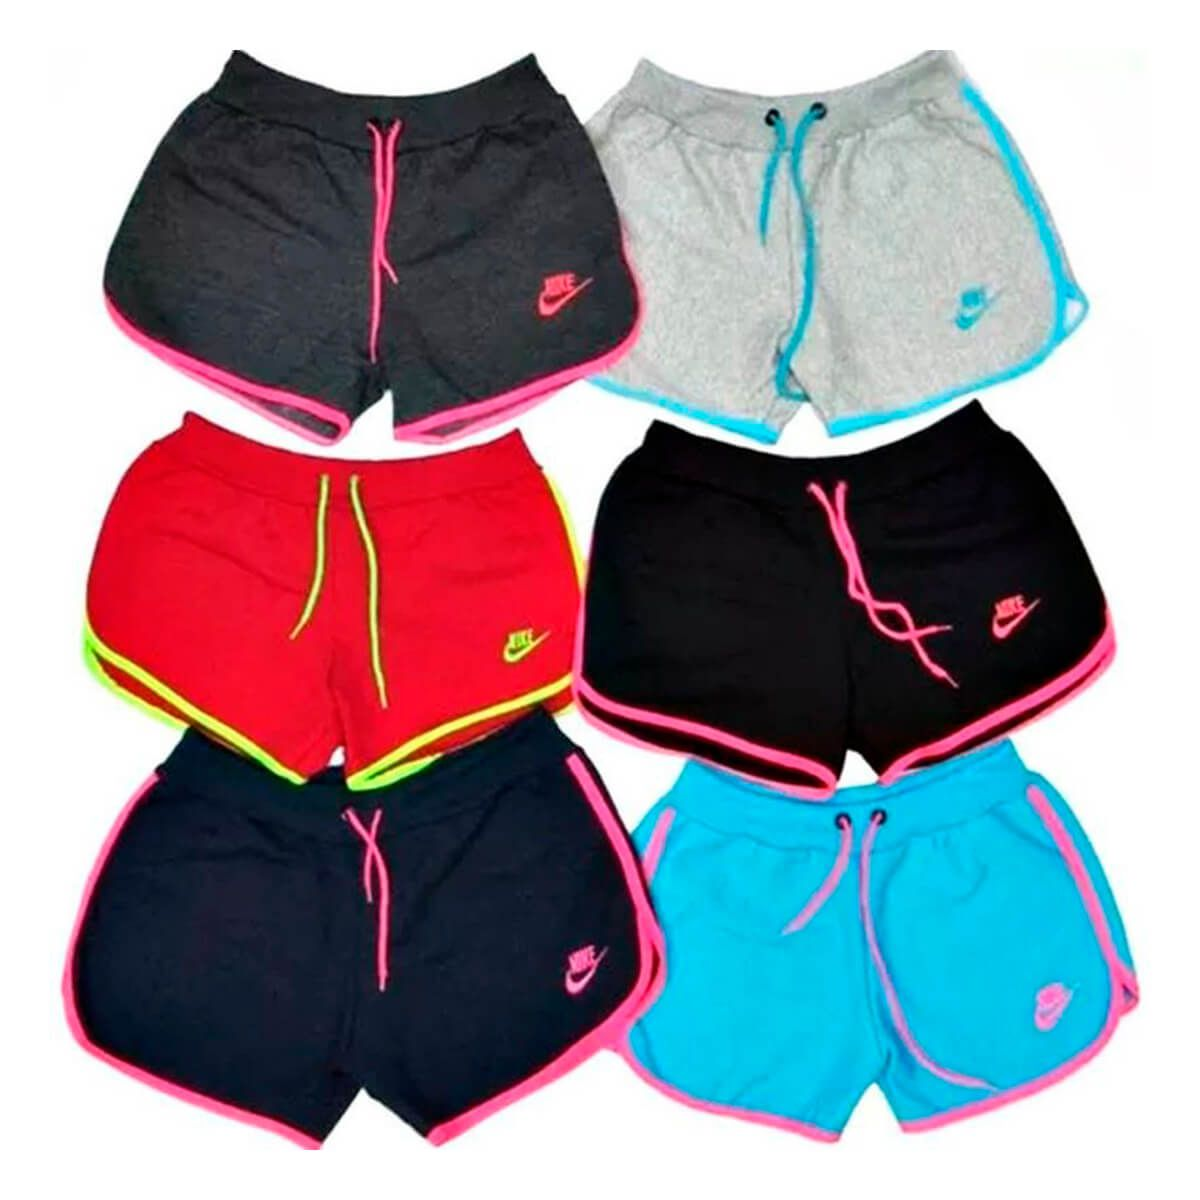 Kit C10 Shorts Moletom Feminino Nike